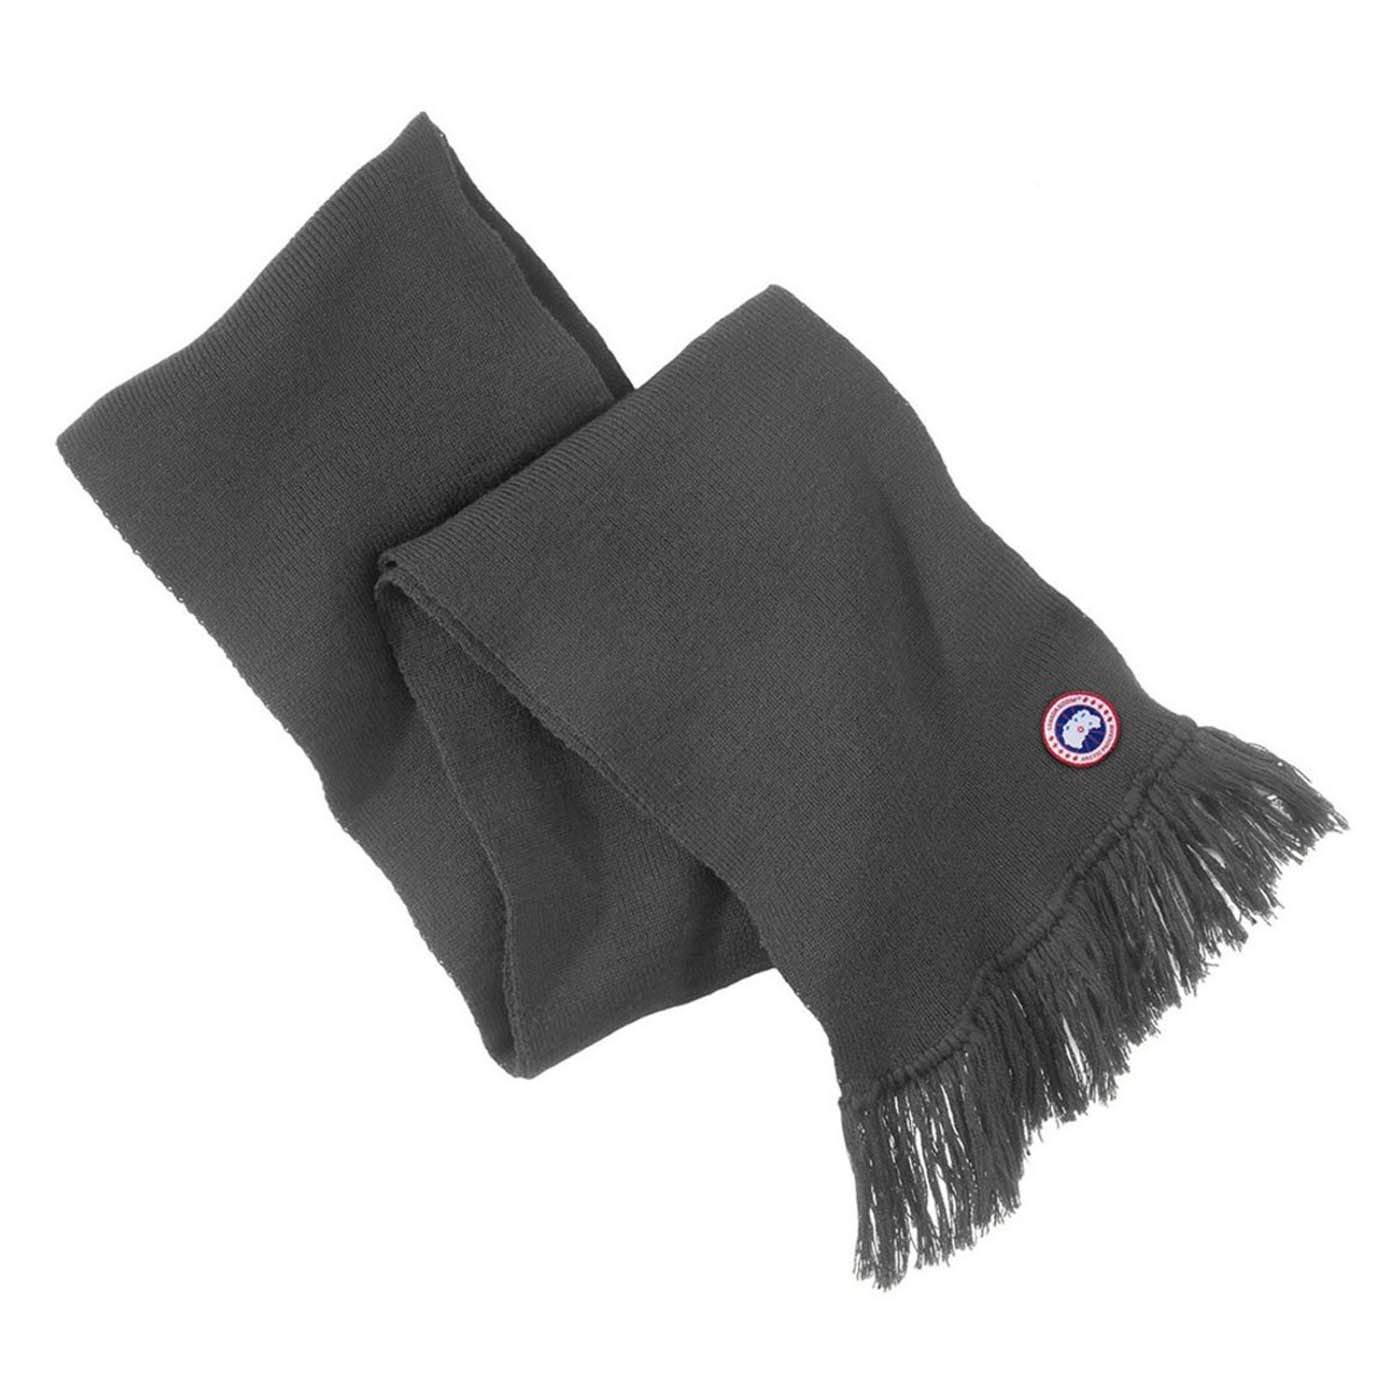 Canada Goose Knit Merino Wool Tassel Scarf Grey 5263L One Size